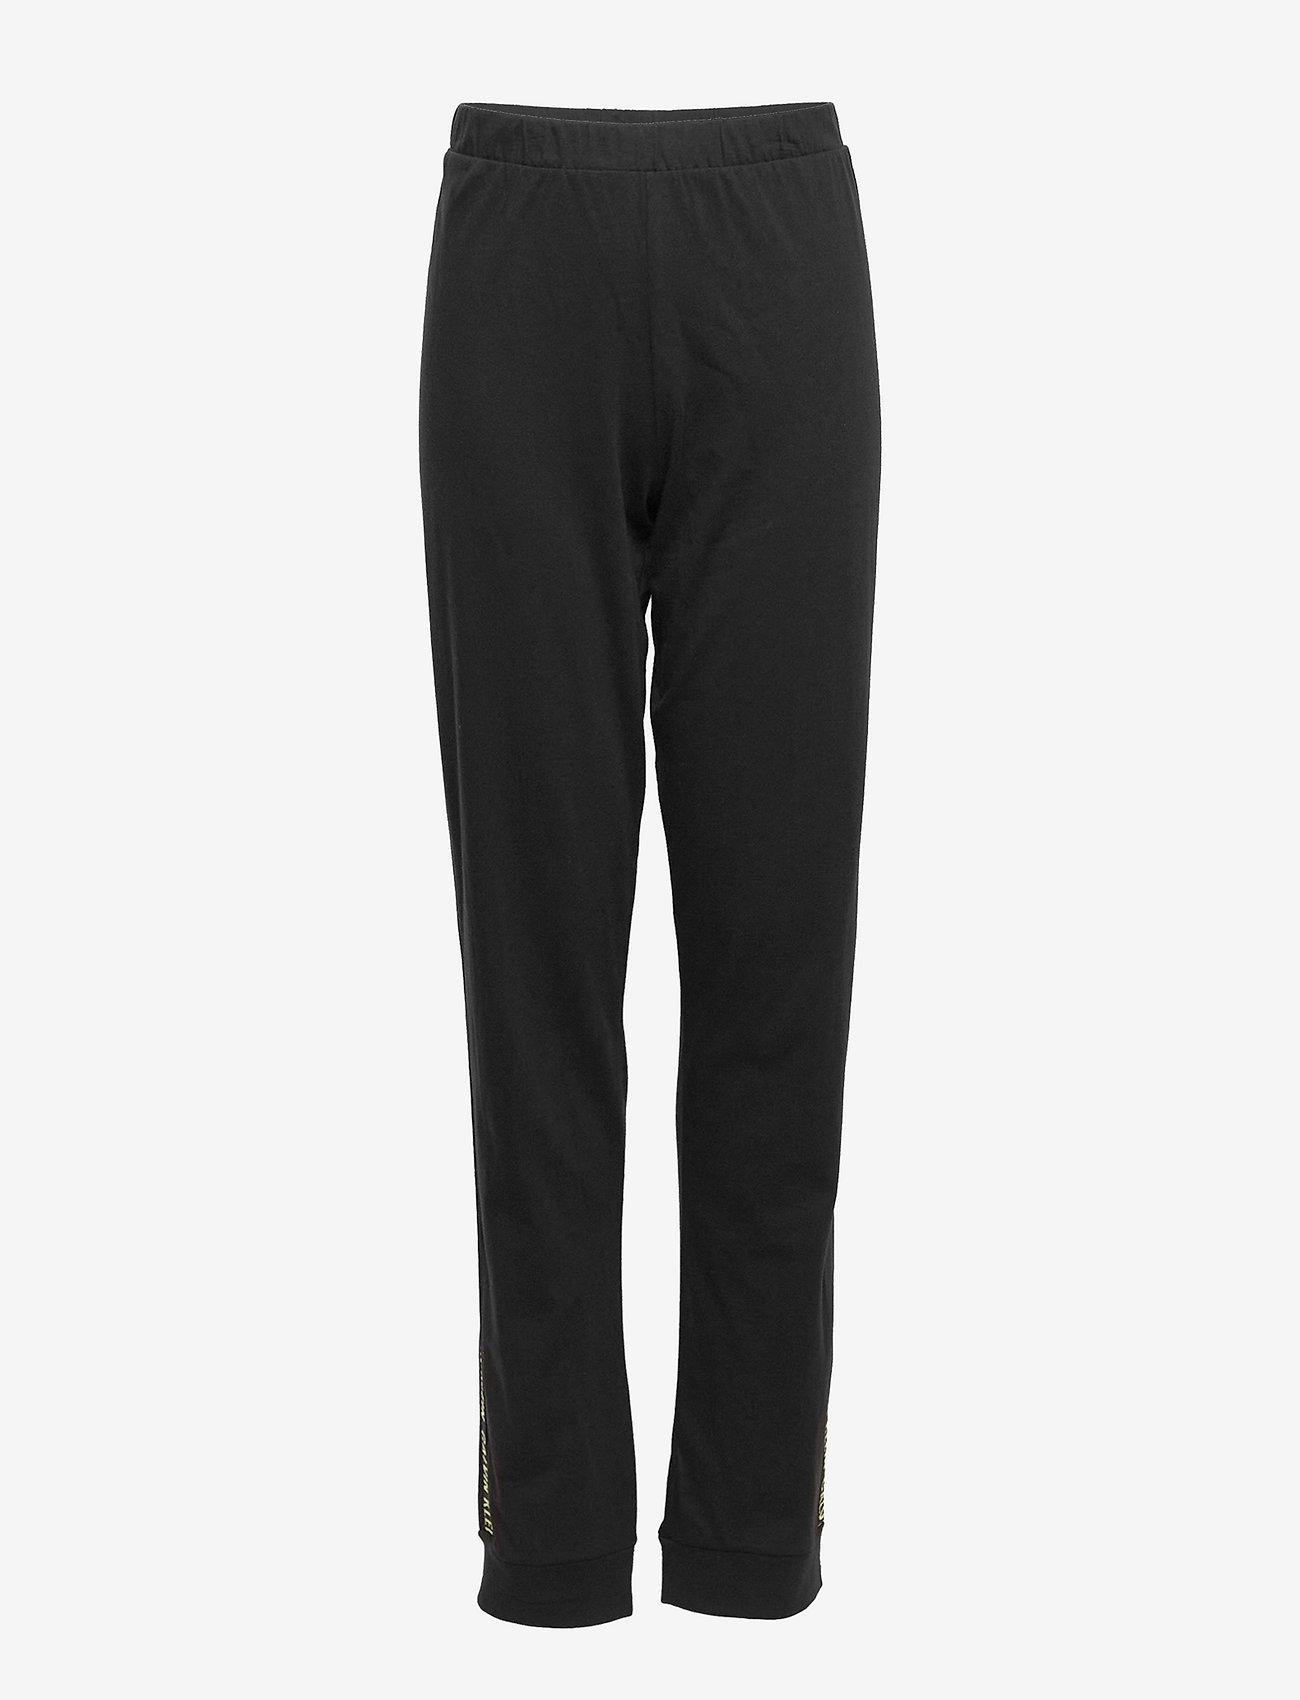 Calvin Klein - KNIT PJ SET (SS+CUFFED PANT) - sæt - pvh black - 4